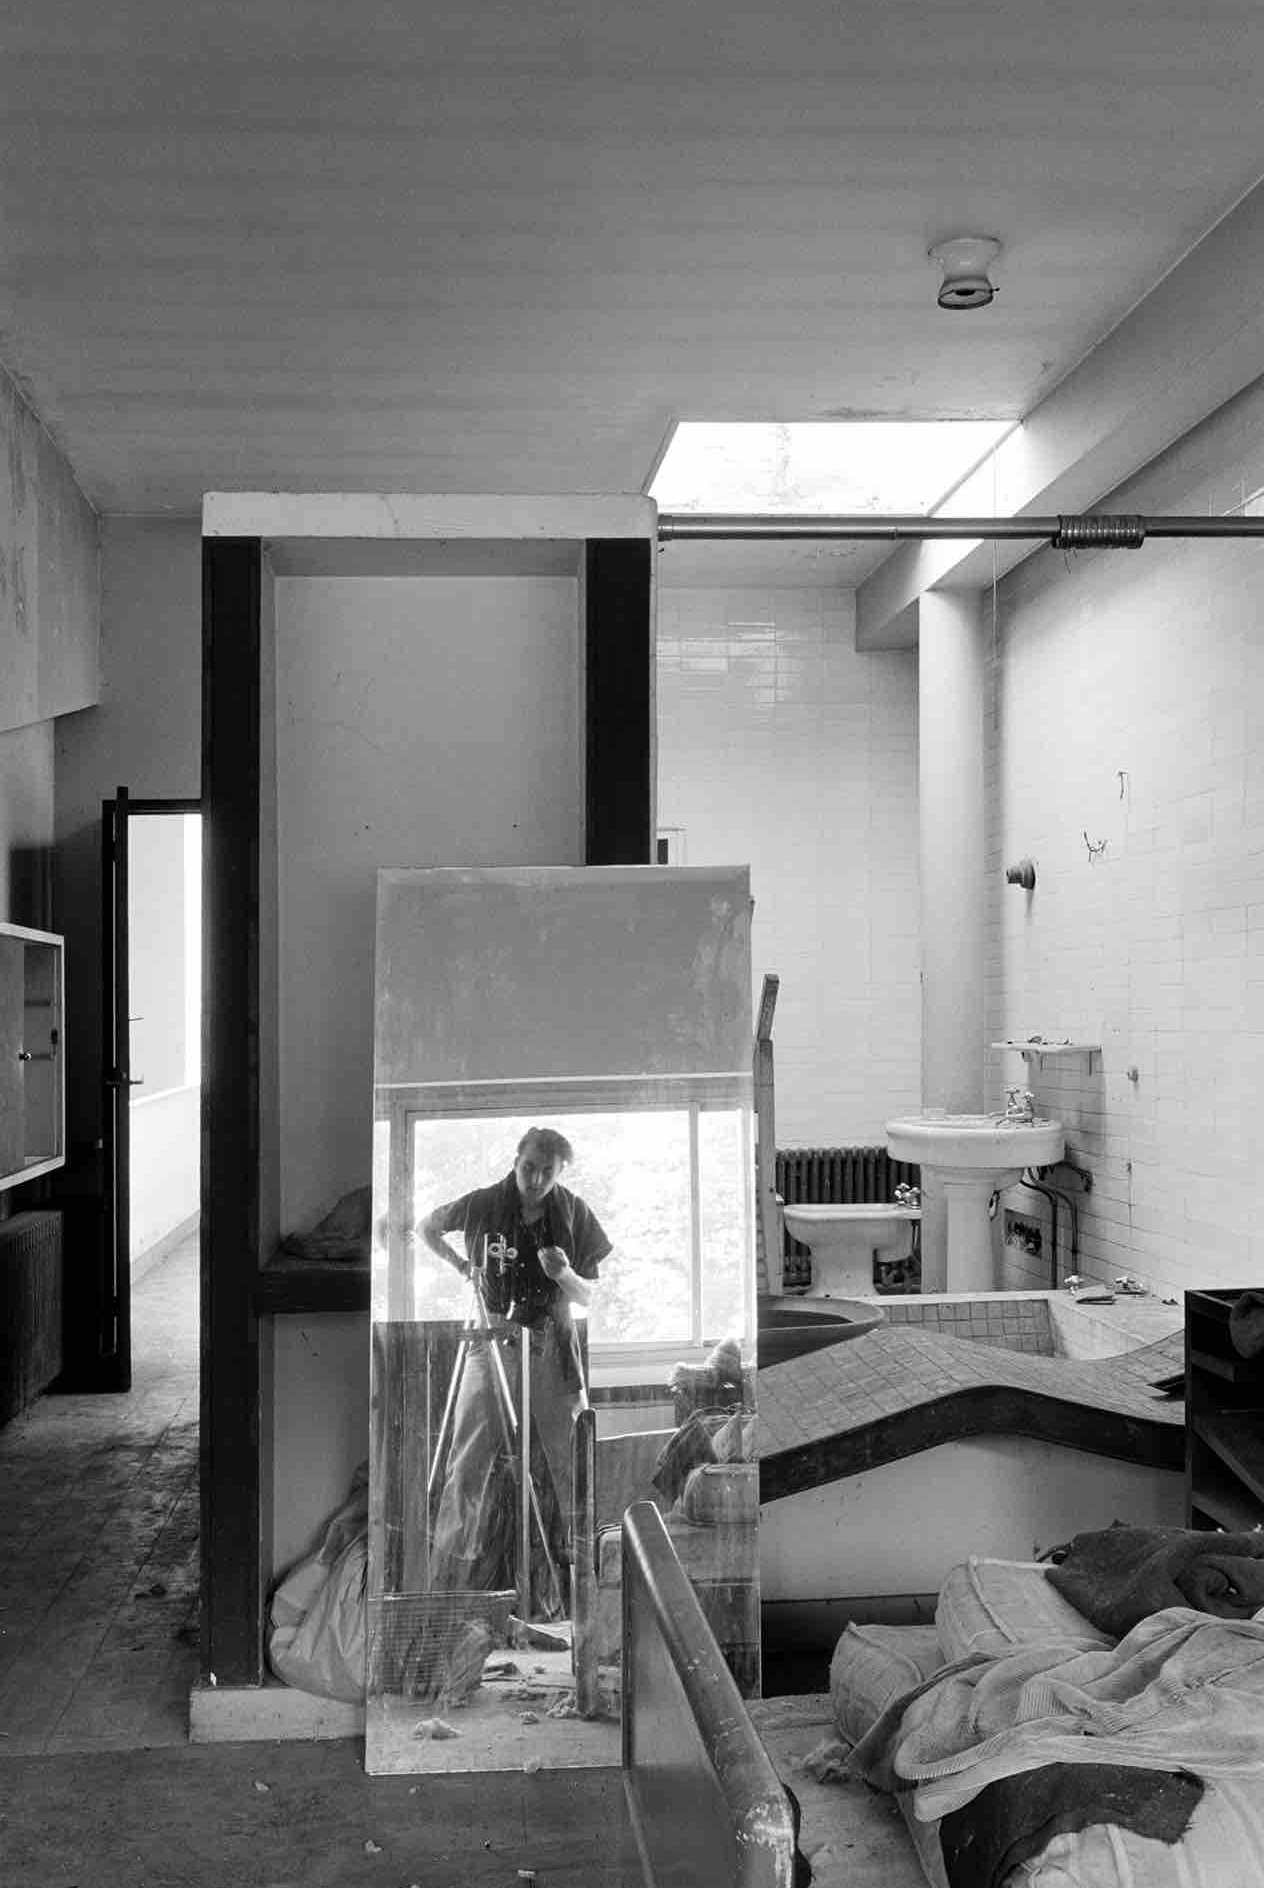 Le Corbusier, Villa Savoye (Poissy, France) 1931